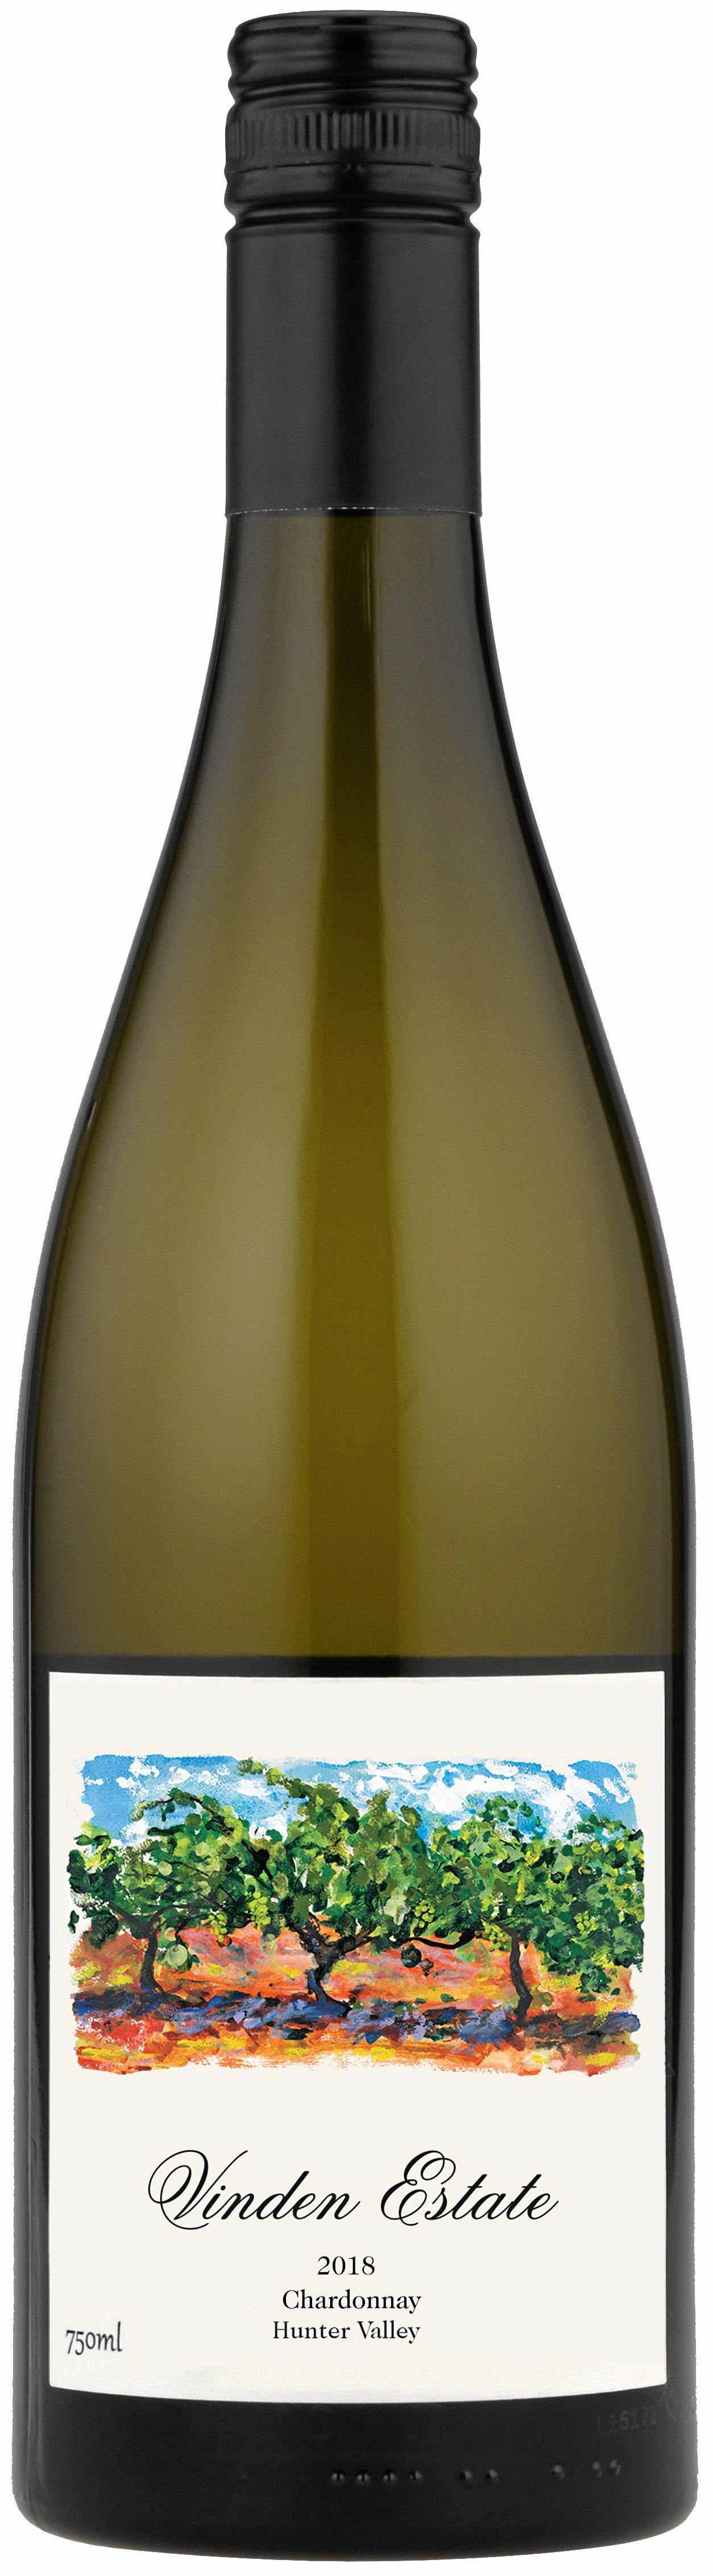 Estate Chardonnay, 2018.